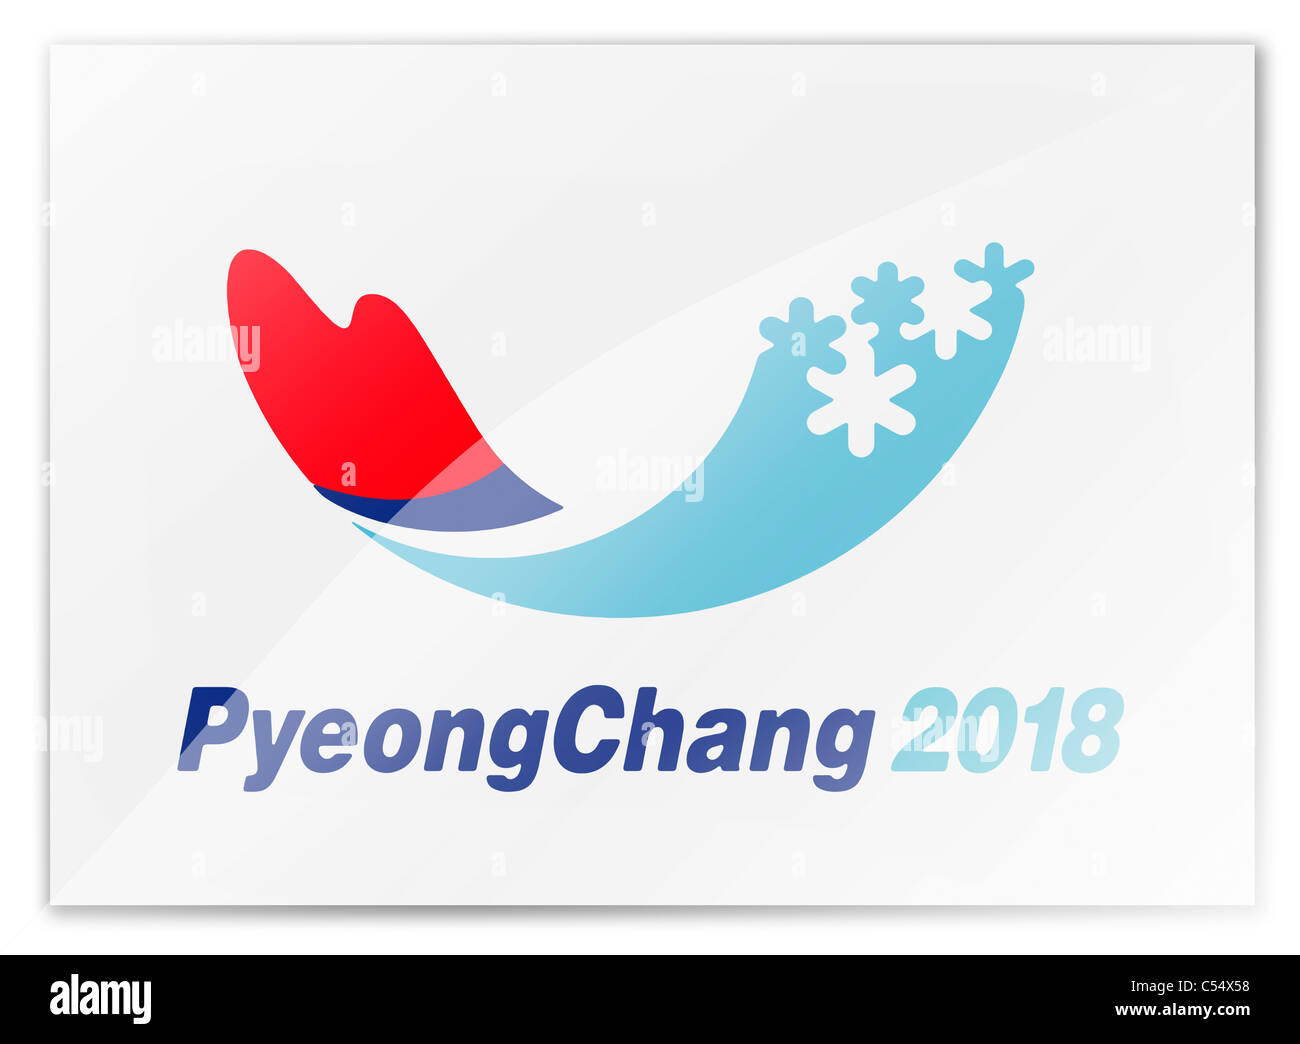 Pyeongchang 2018 winter olympic games logo flag symbol icon emblem pyeongchang 2018 winter olympic games logo flag symbol icon emblem buycottarizona